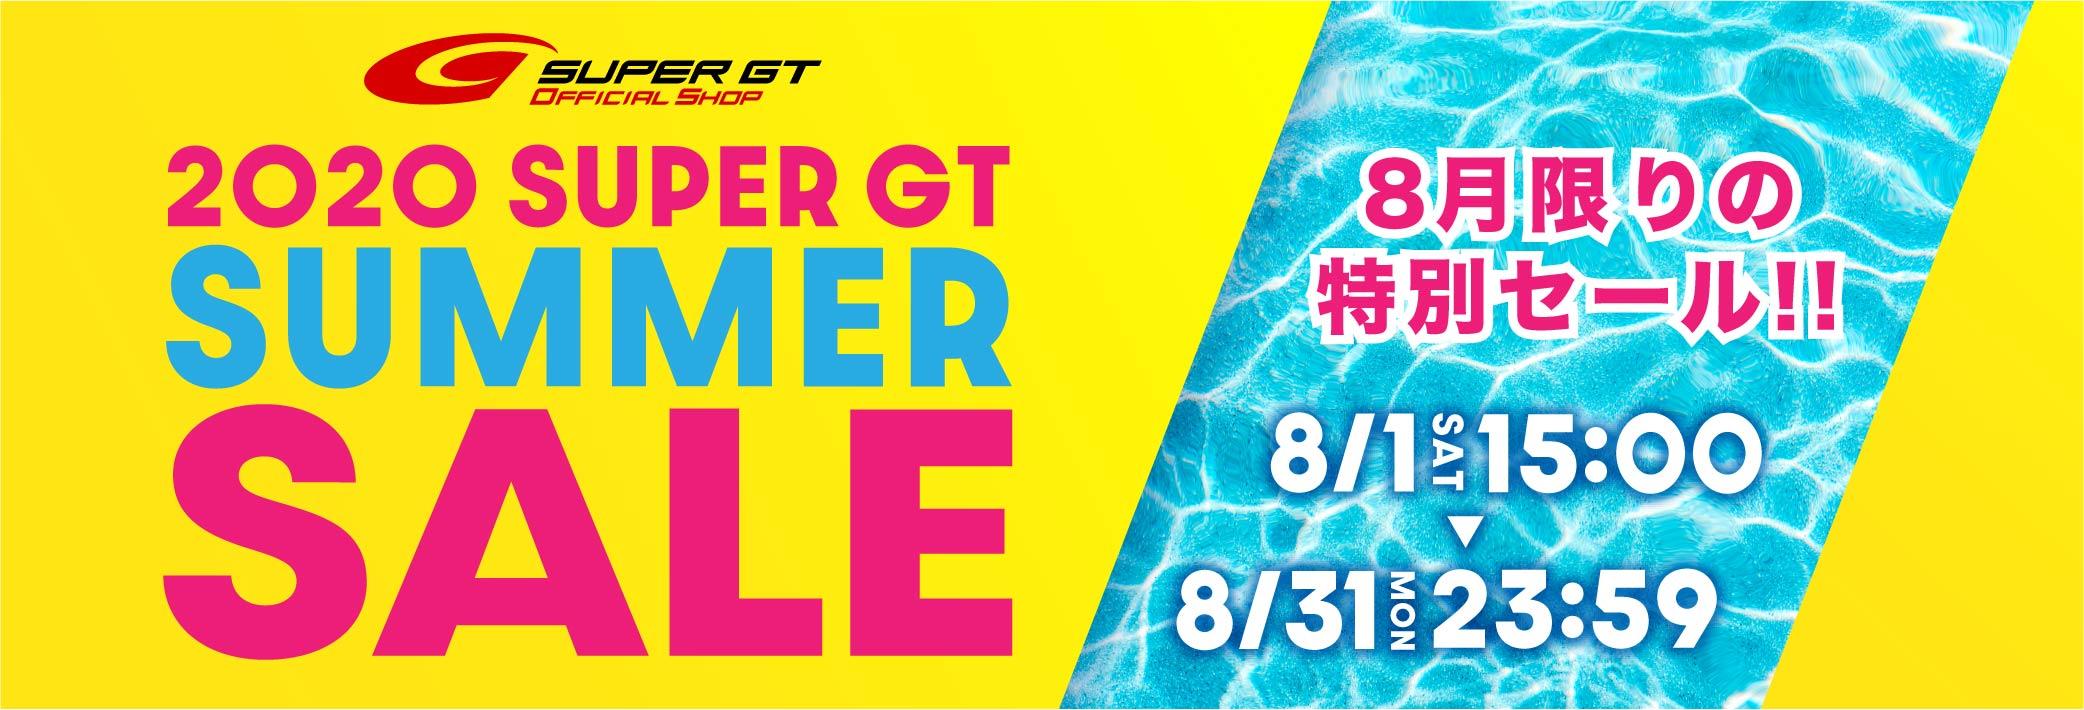 2020 SUPER GT SUMMER SALE